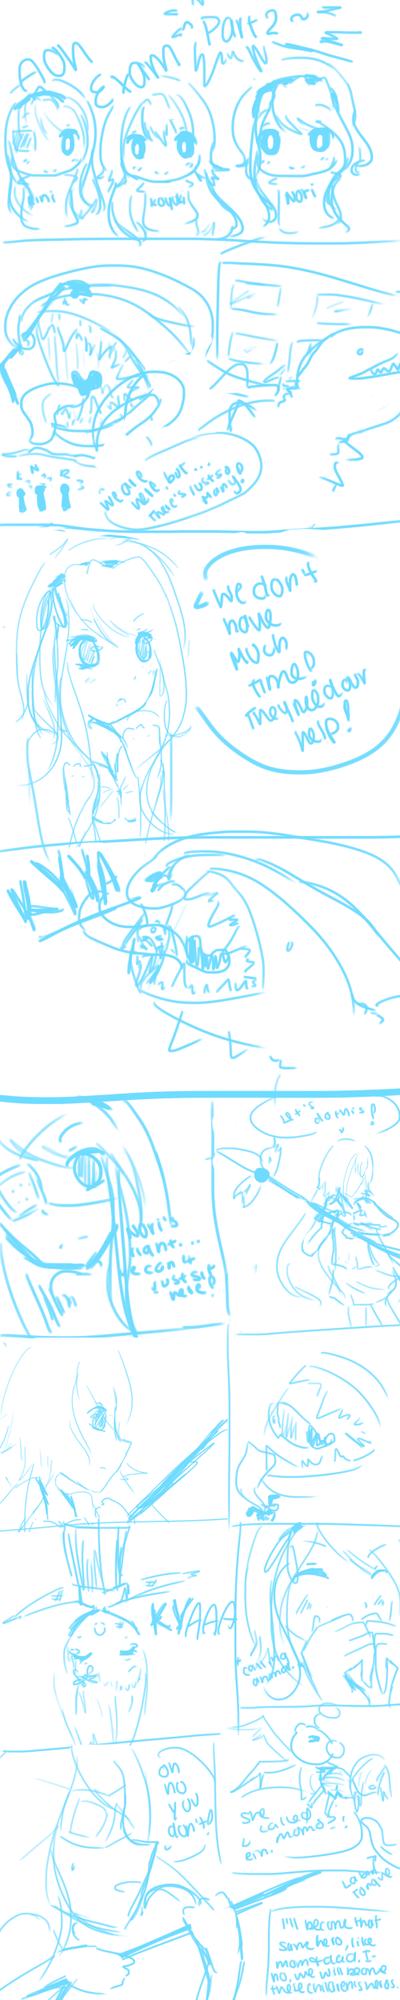 AoH: Exam Part 2 by PurpleKimiko